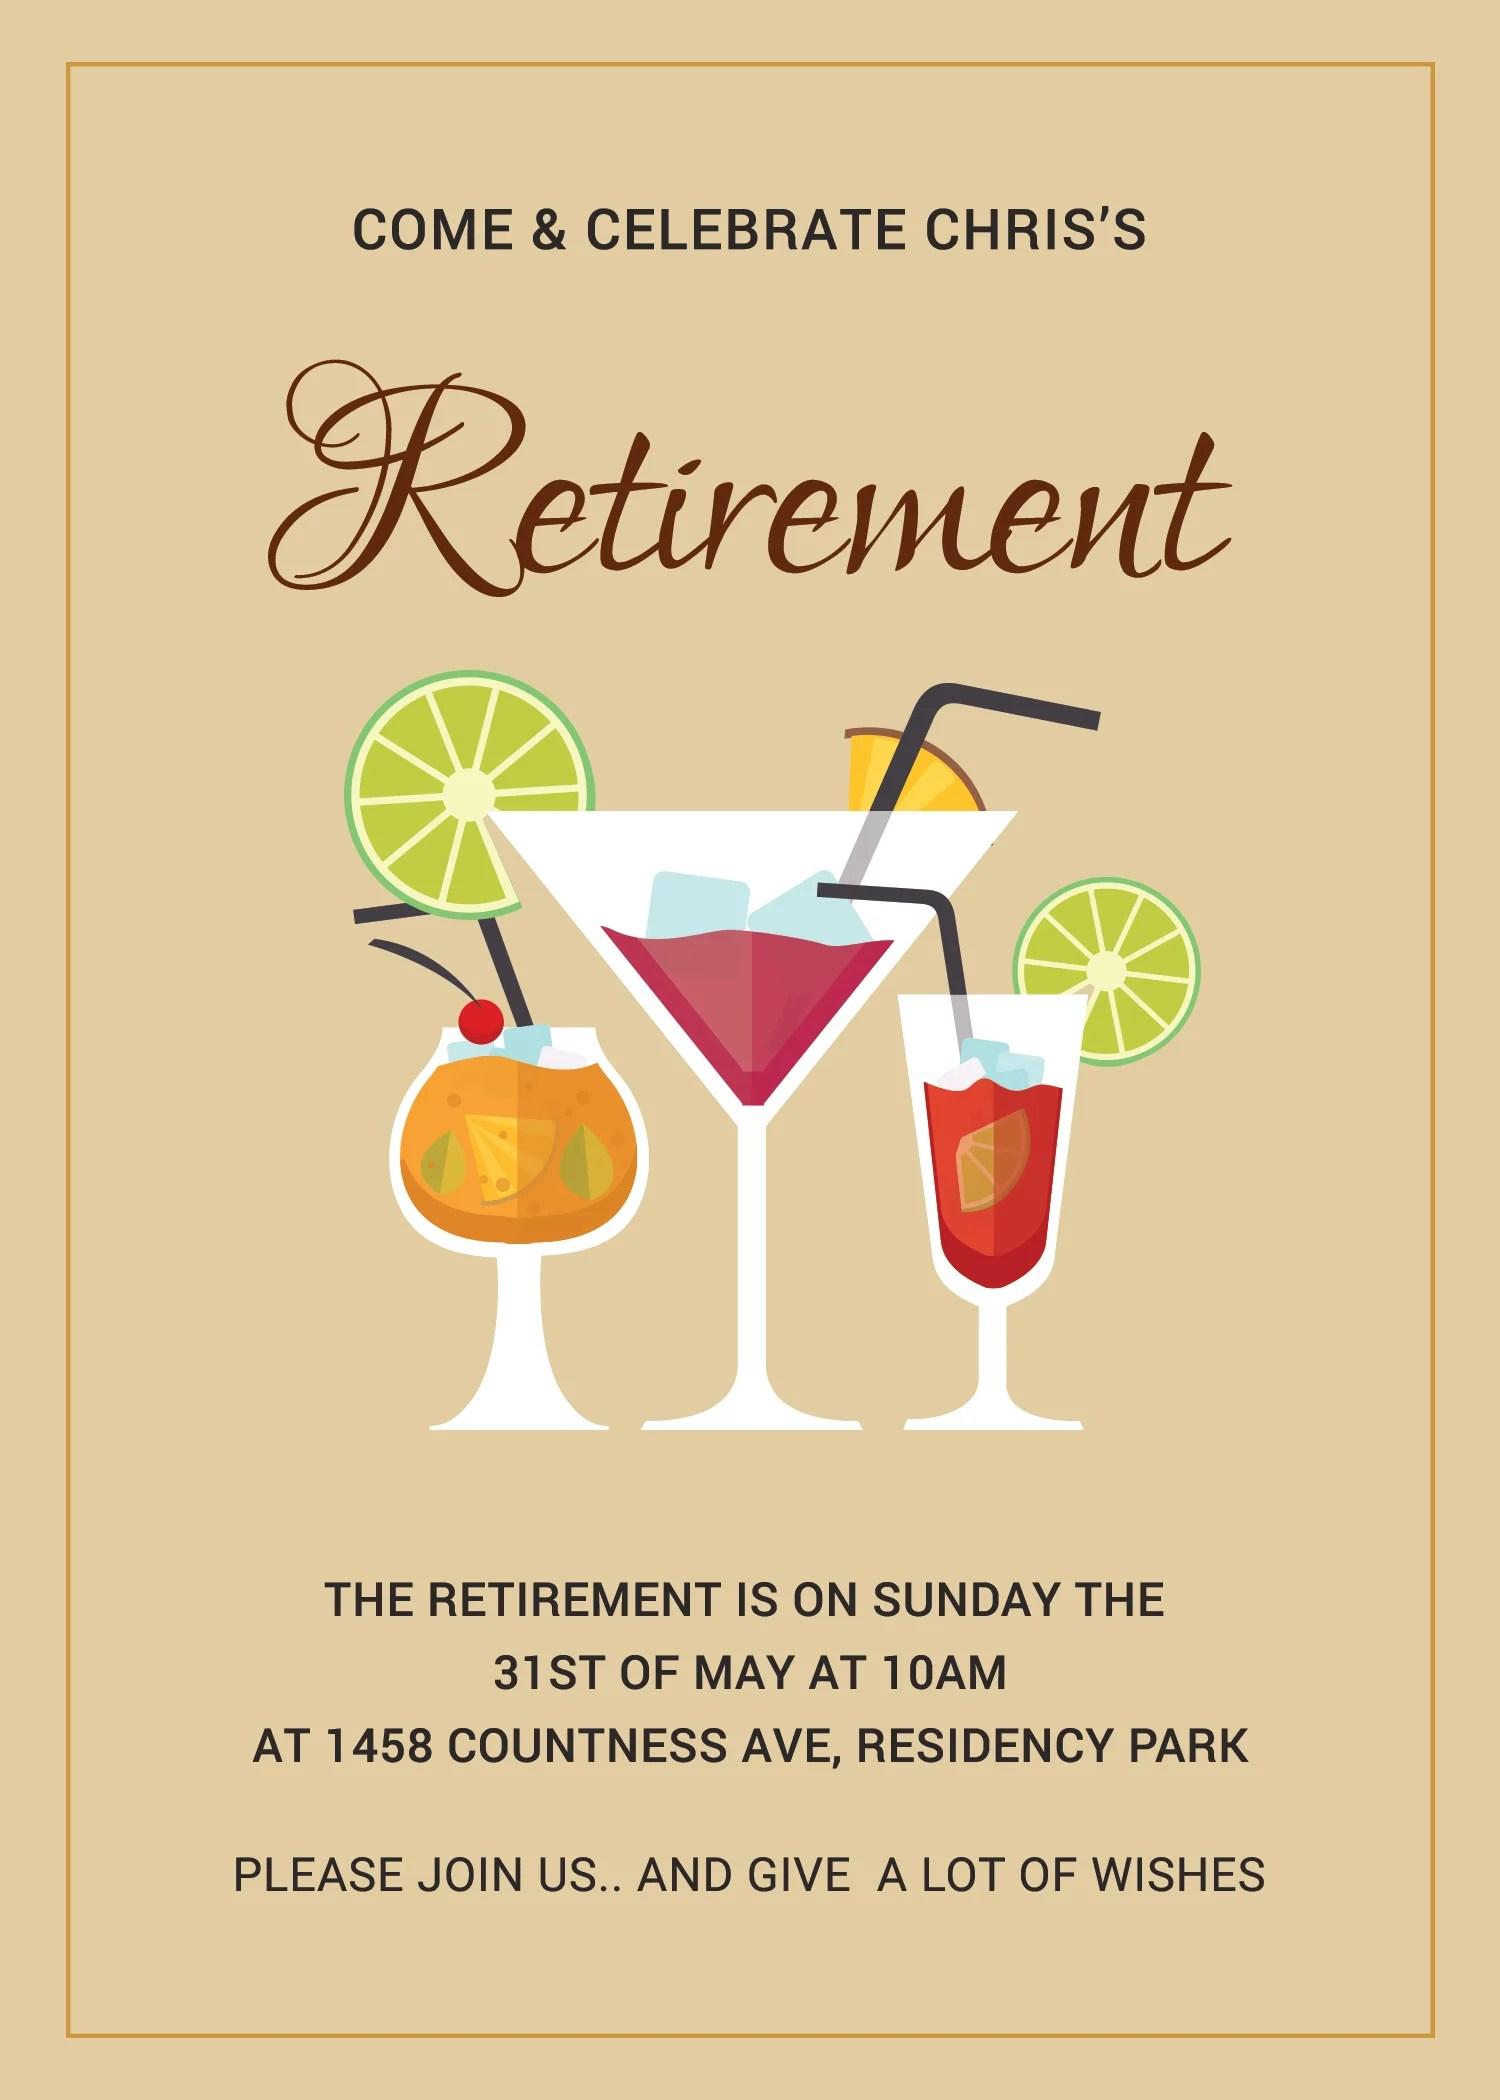 Printable Retirement Party Invitation Template In Adobe Photoshop Illustrator